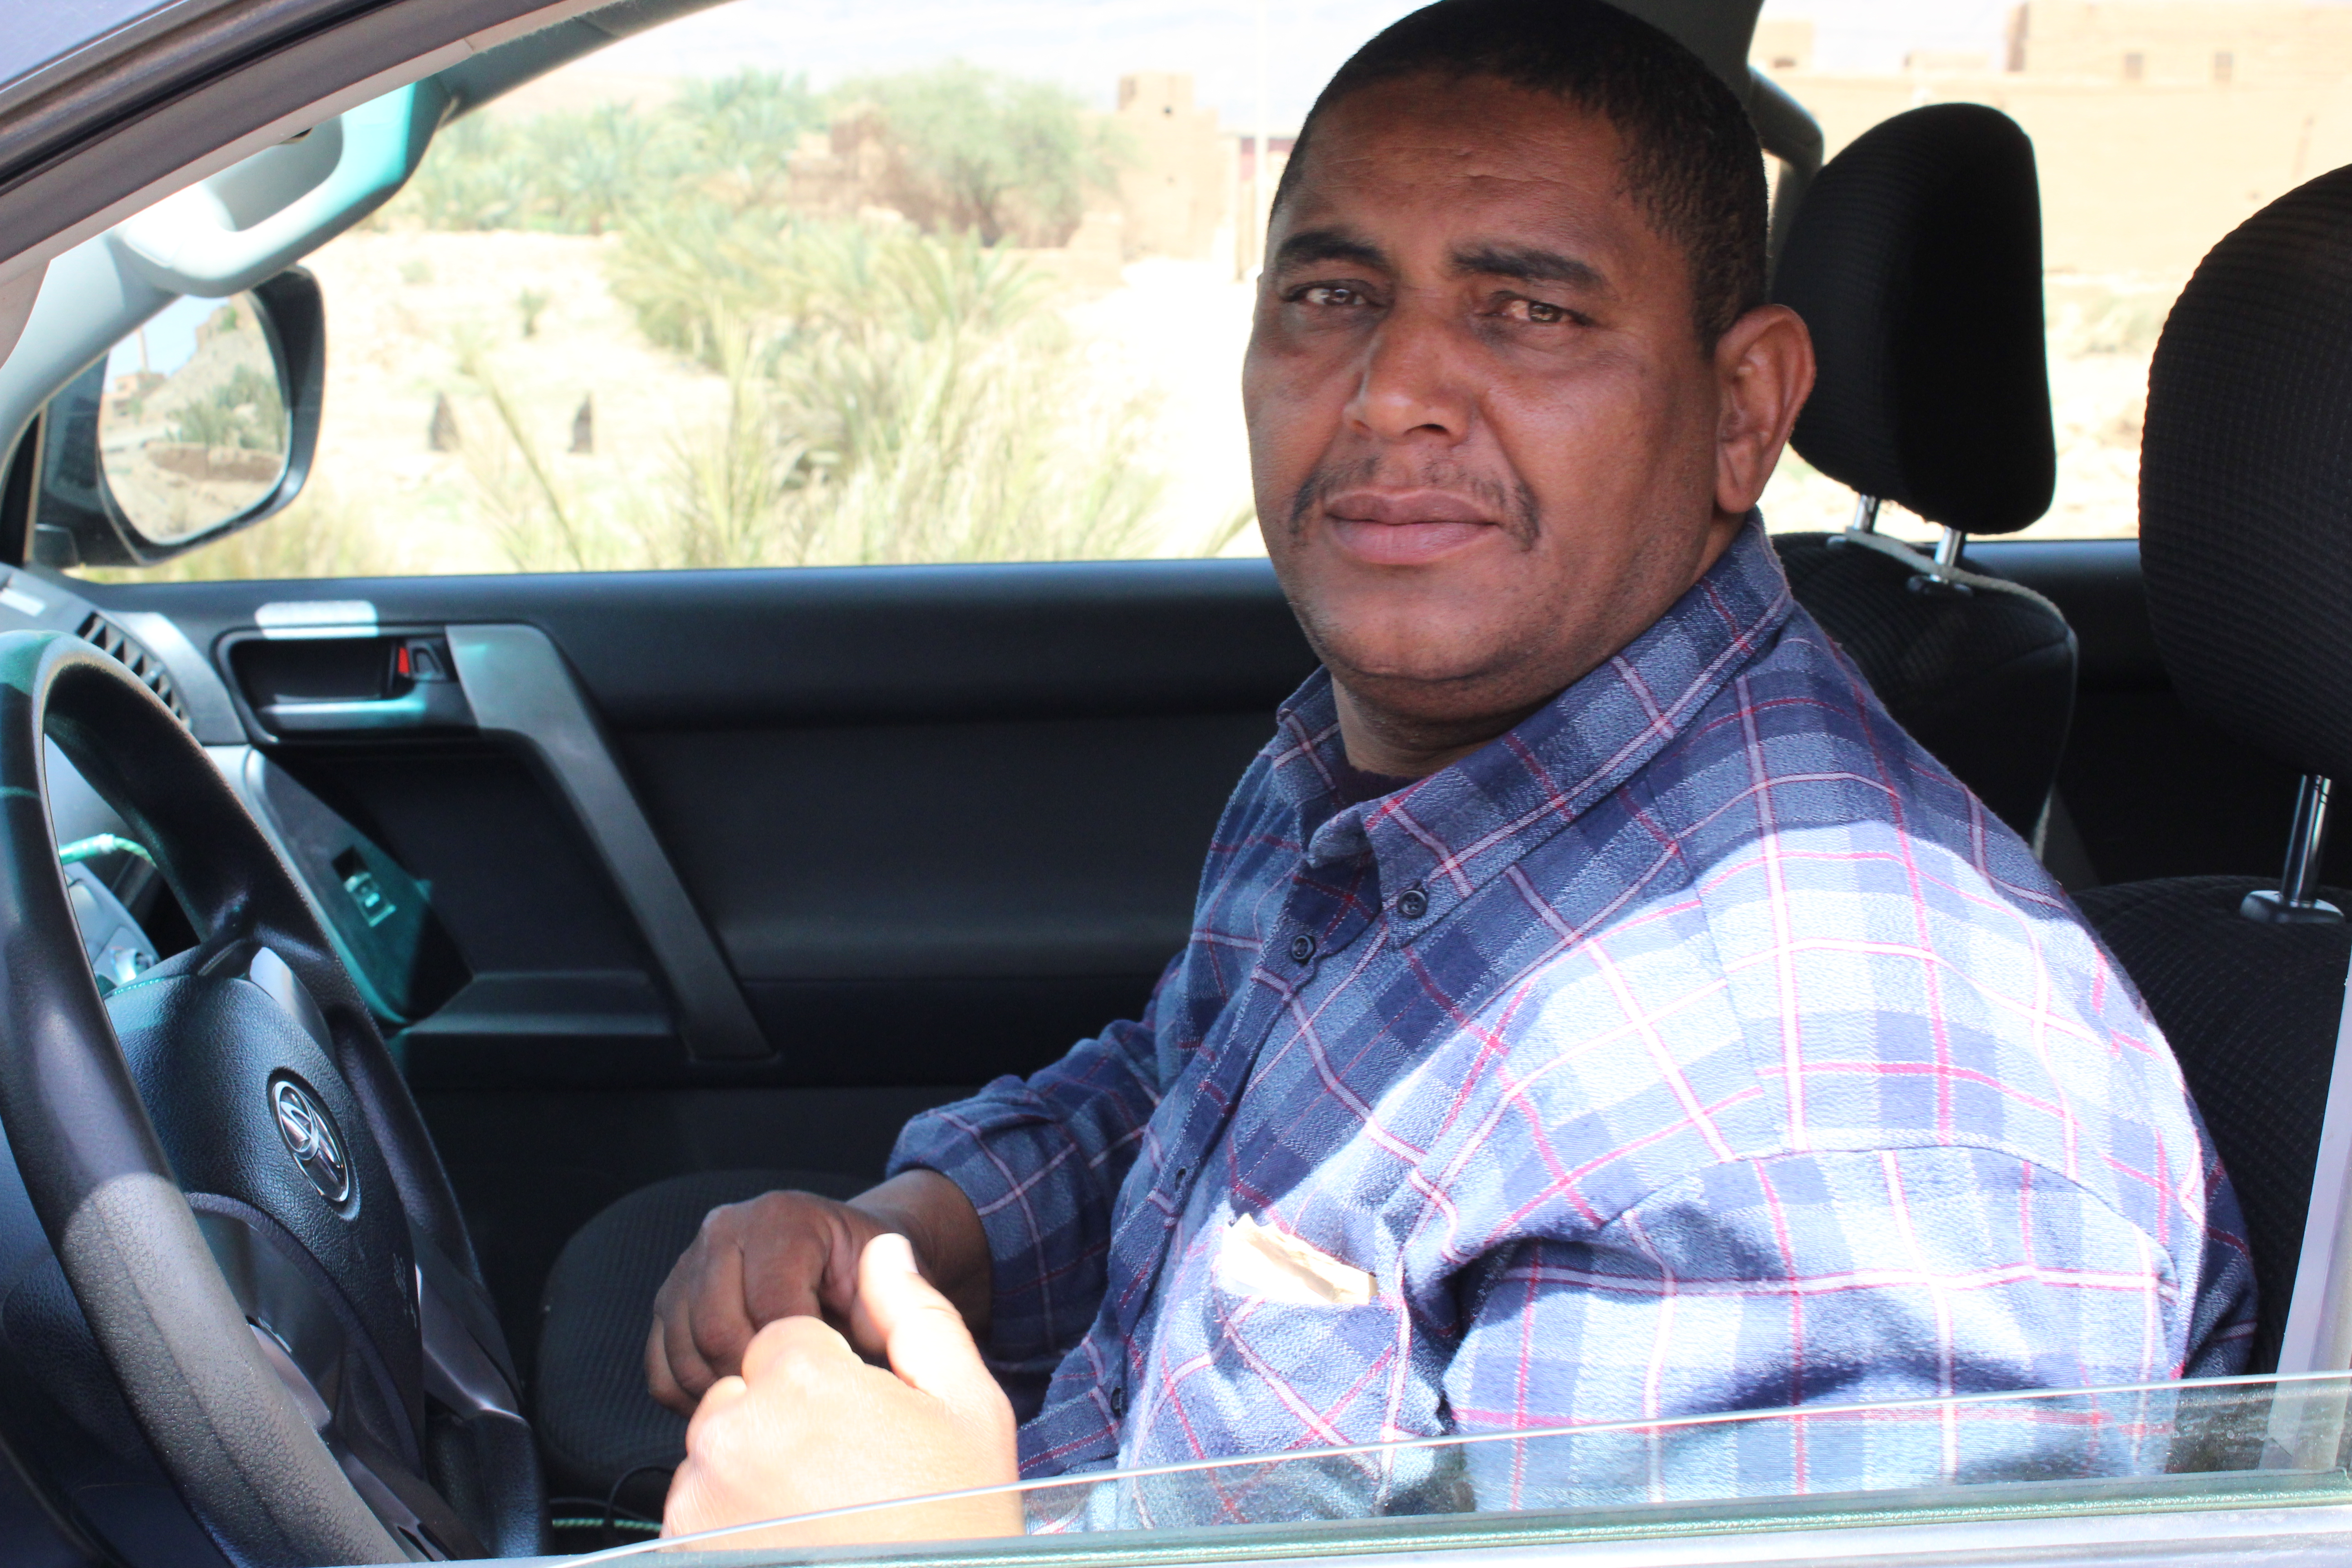 Abdul in his car in Morocco